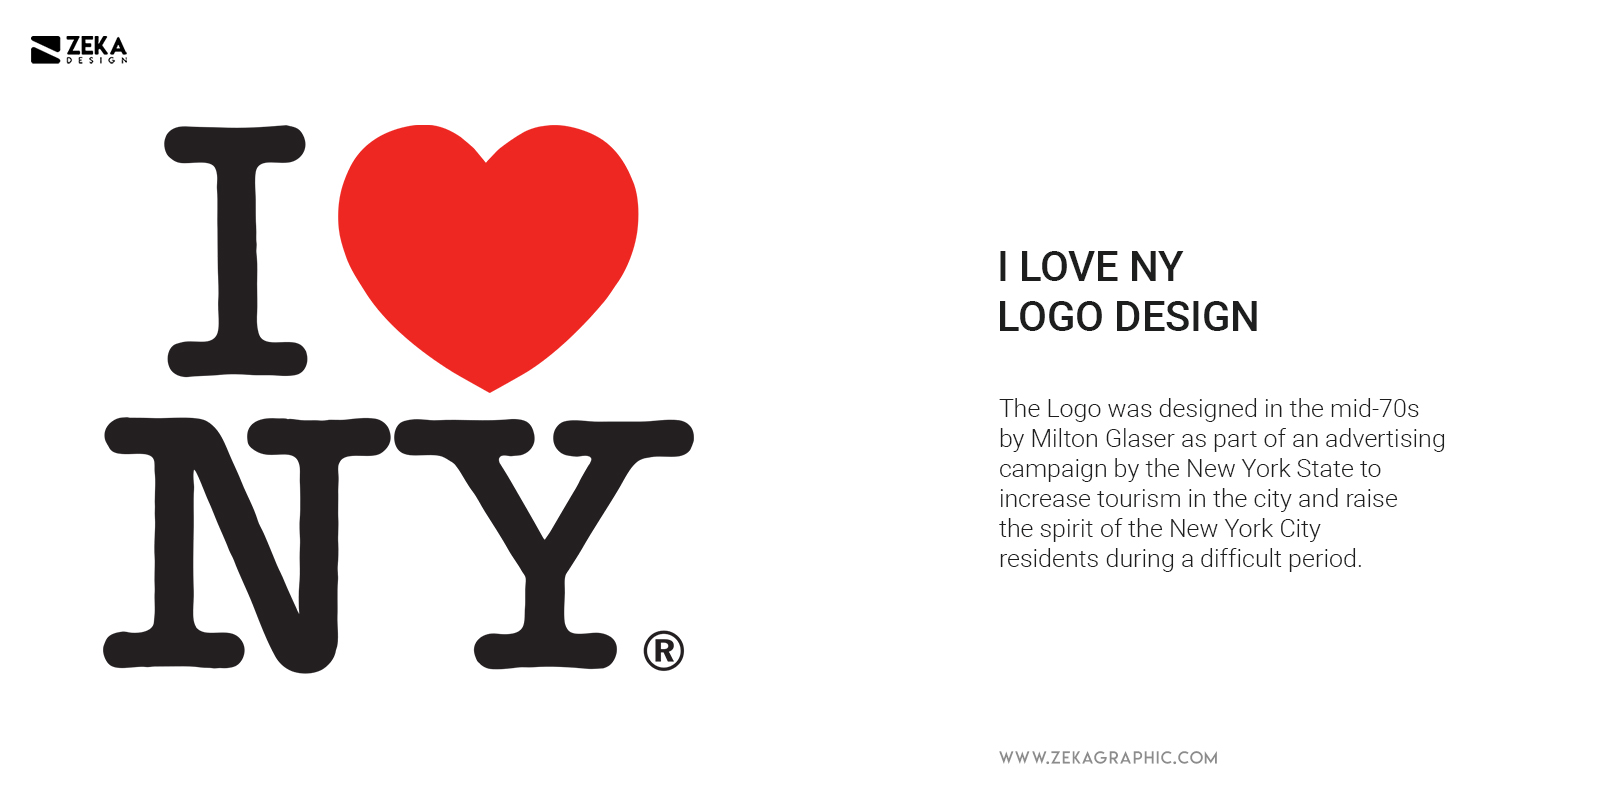 I Love New York Logo Design History by Milton Glaser